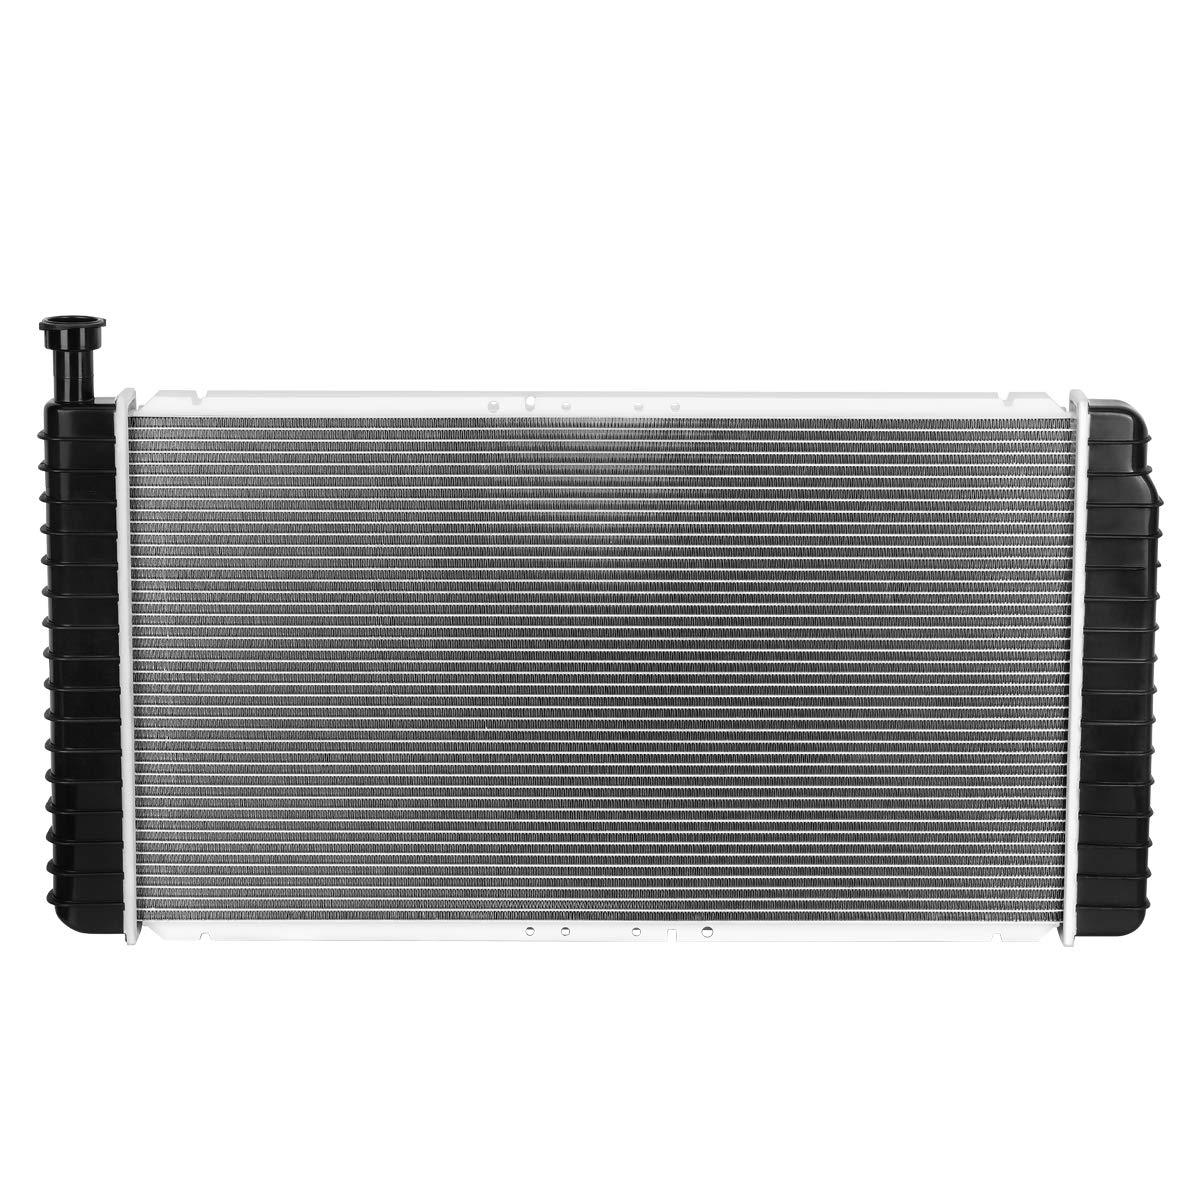 New Replacement Aluminum Radiator for Chevy Express GMC Savana 1500 2500 3500